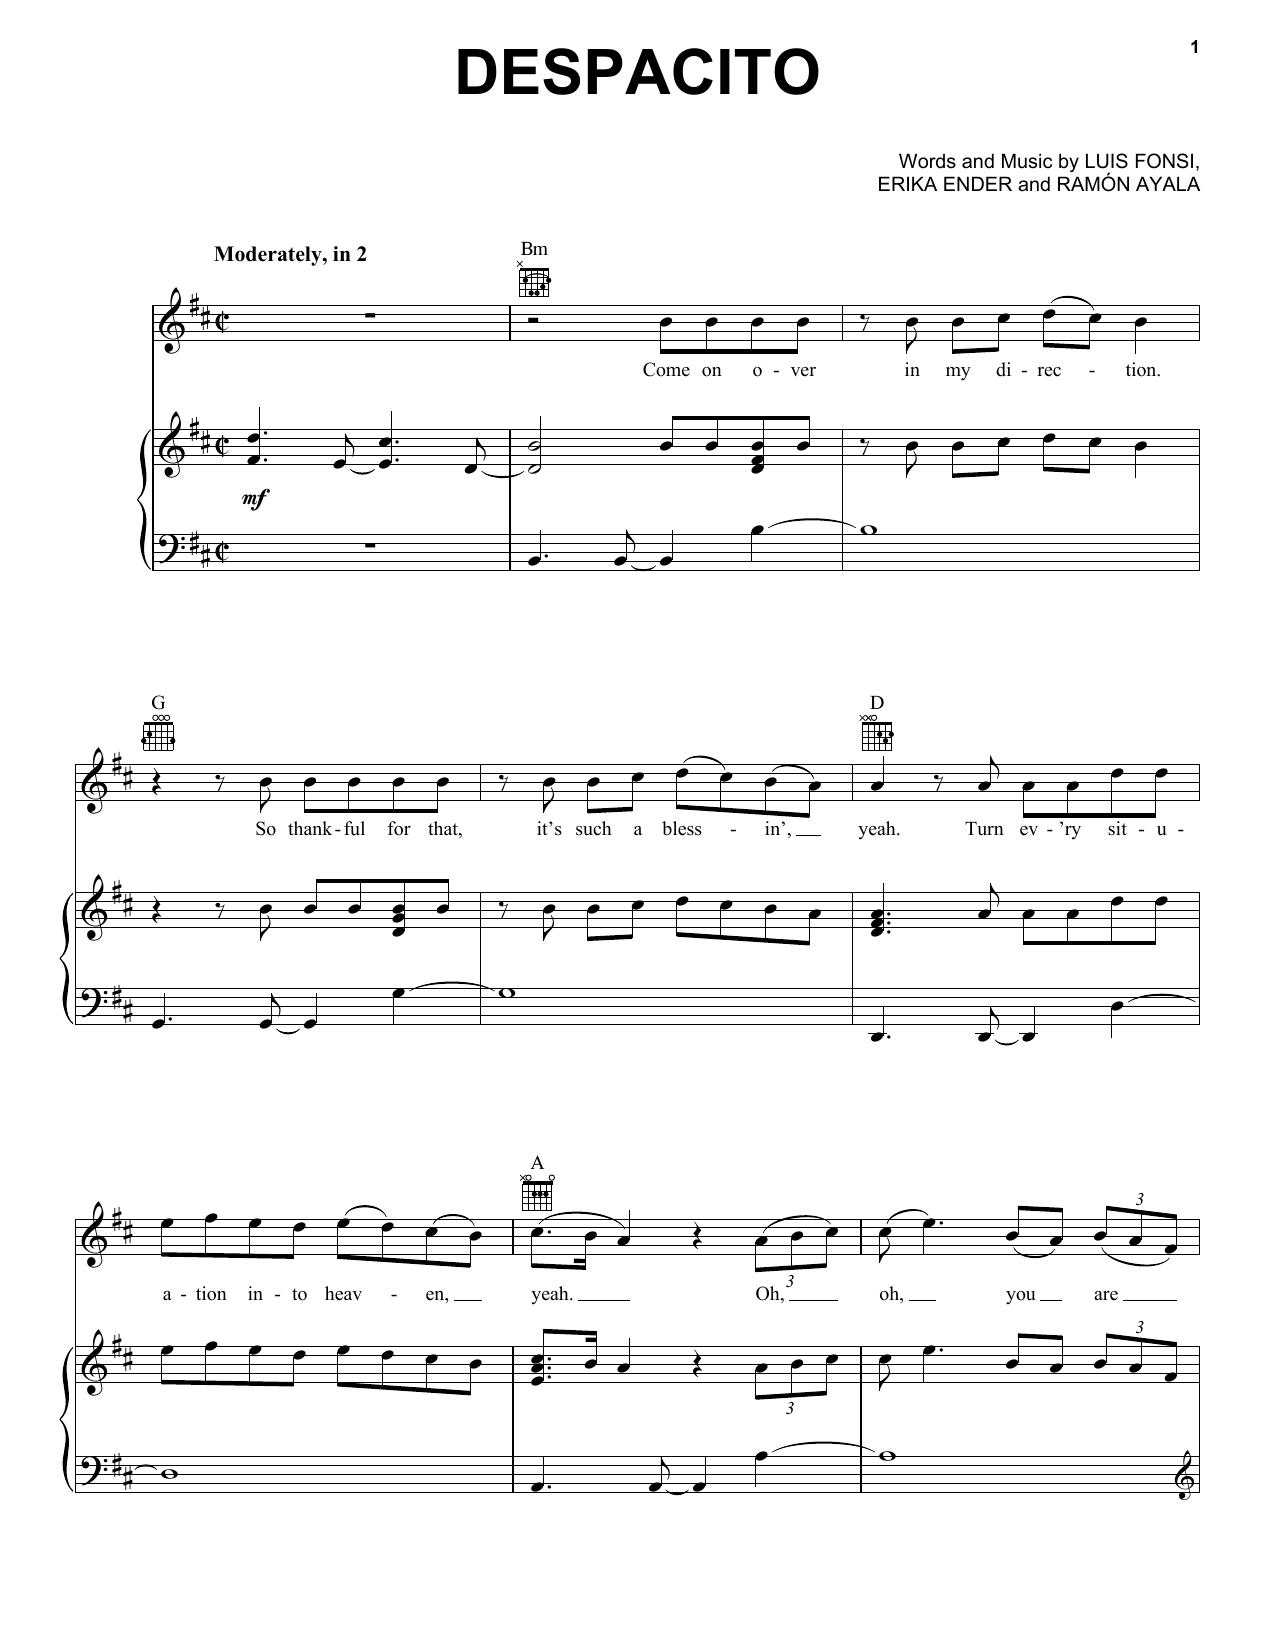 Luis Fonsi Daddy Yankee Feat Justin Bieber Despacito Sheet Music Notes Chords Flute Sheet Music Music Notes Violin Sheet Music